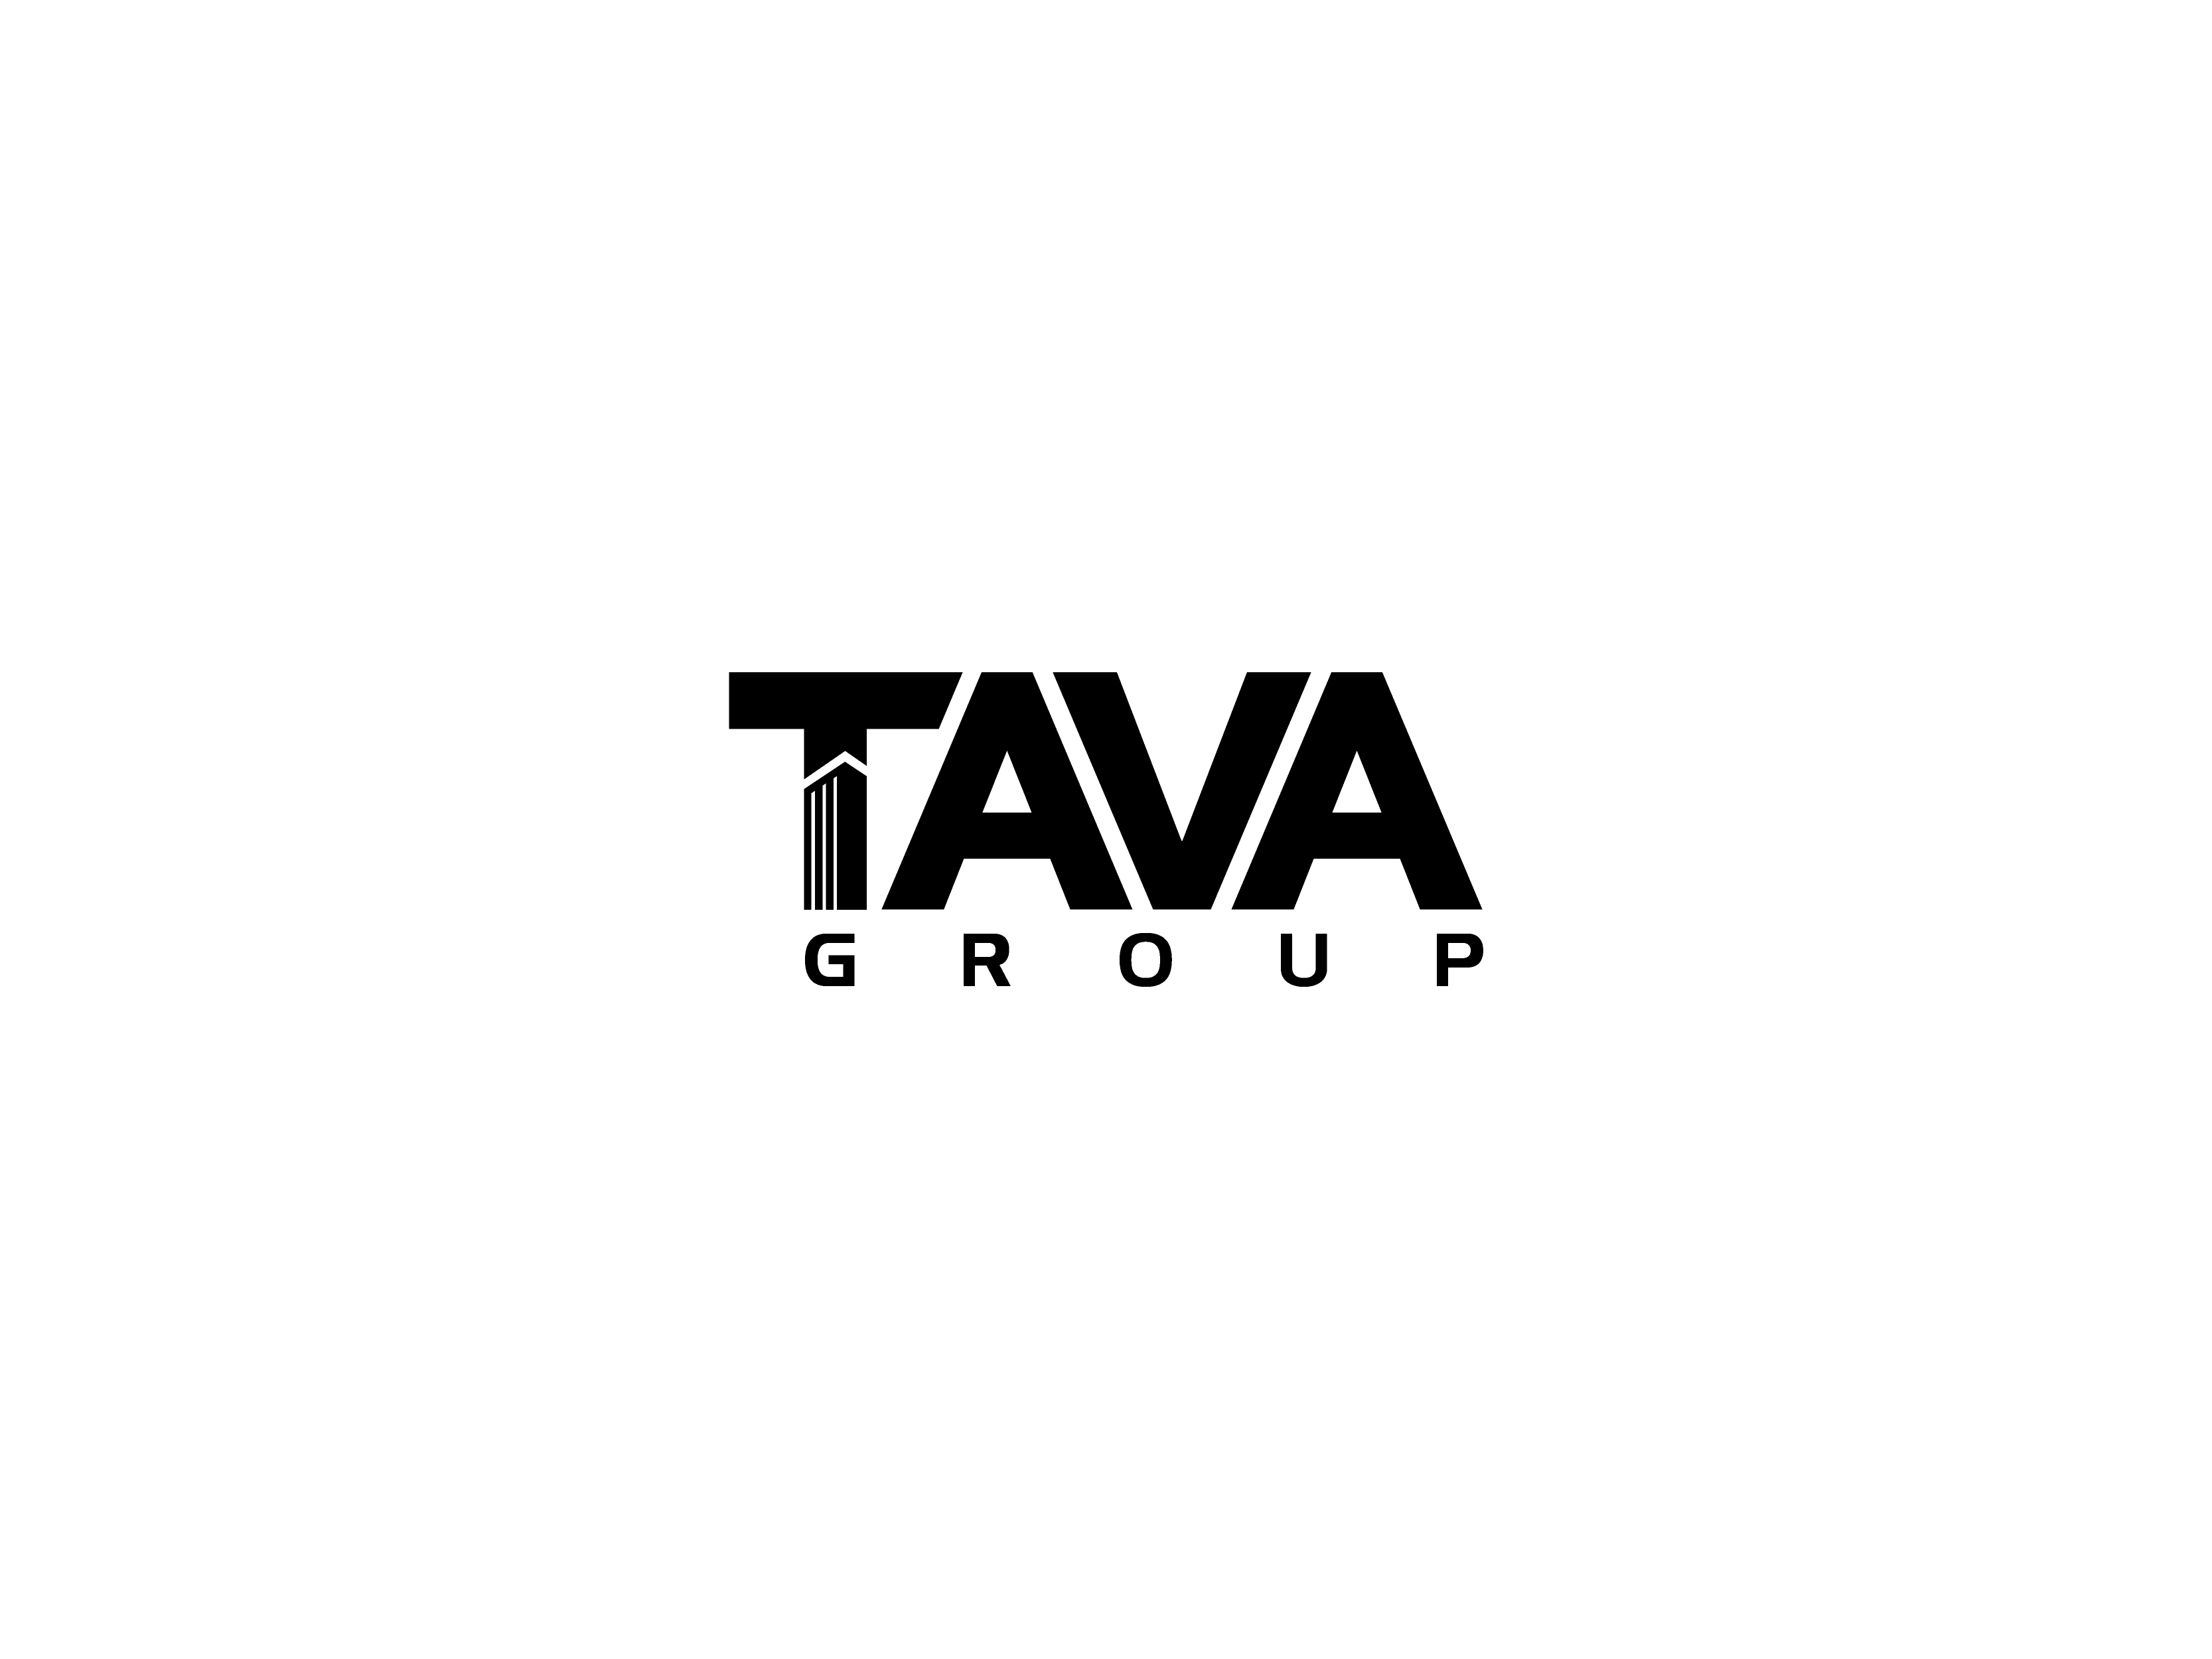 Logo Design by Shivaprasad Sangondimath - Entry No. 320 in the Logo Design Contest Creative Logo Design for Tava Group.